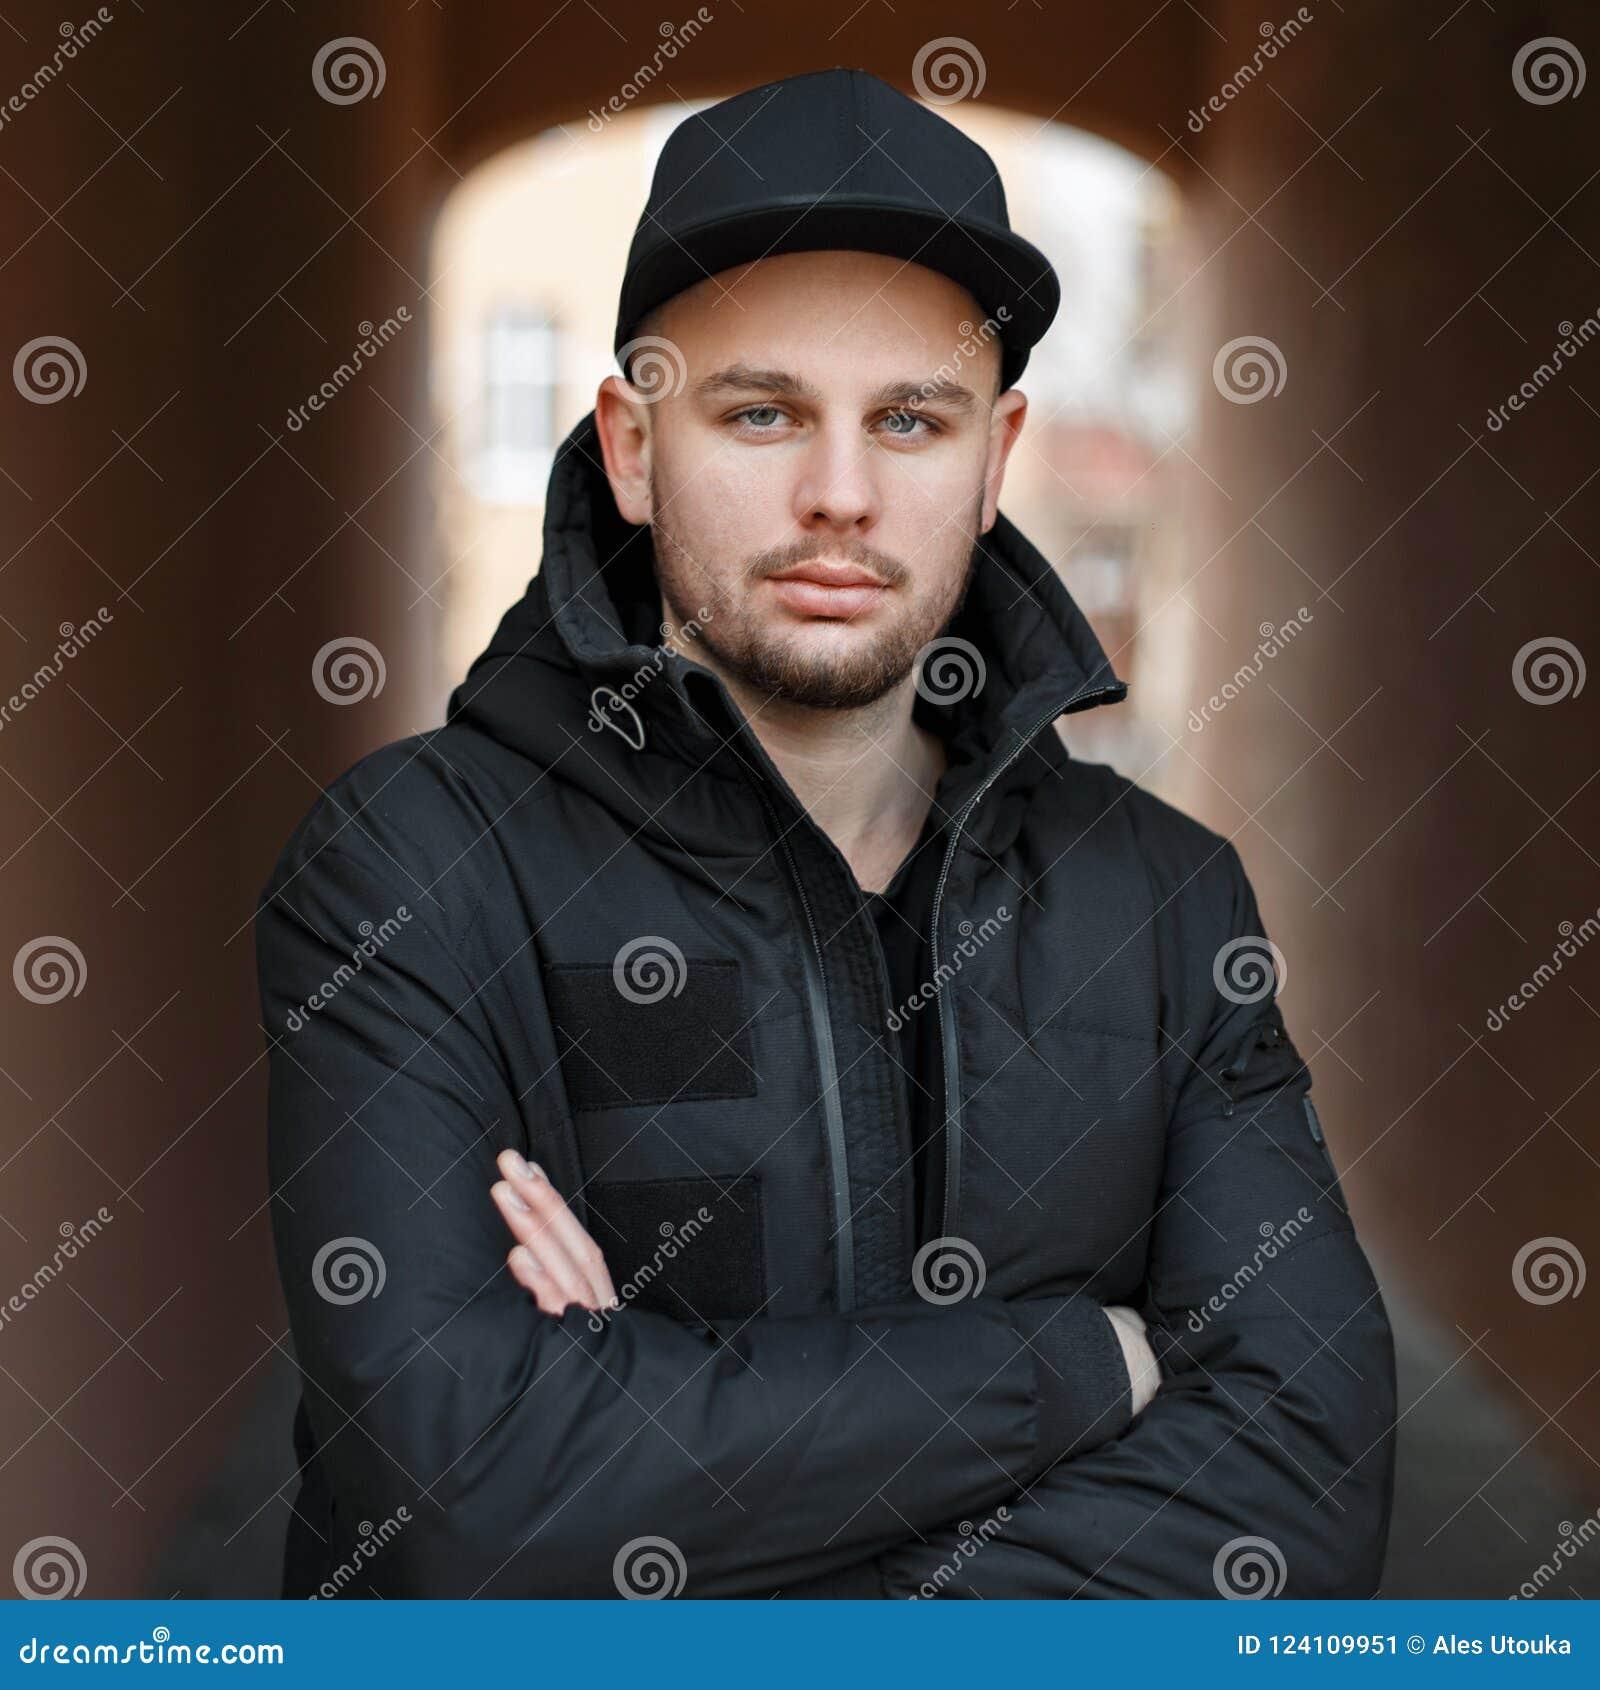 b3fde1dcfa2 Handsome Stylish Man In A Black Baseball Cap And Winter Jacket Stock ...